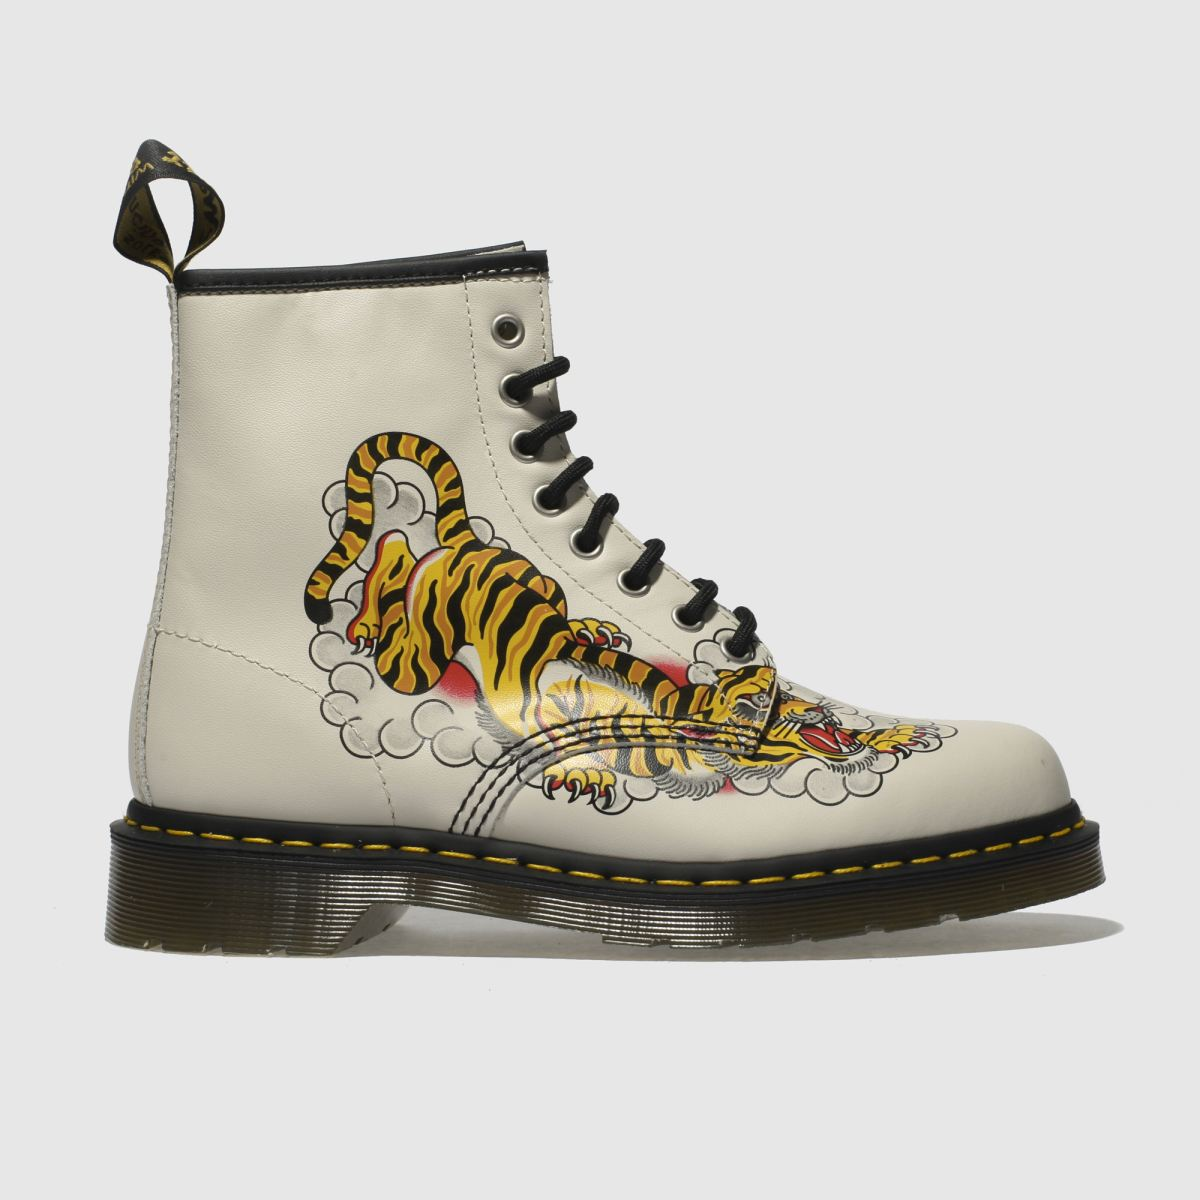 Dr Martens Stone & Black 1460 Grez Tattoo Tiger Boots